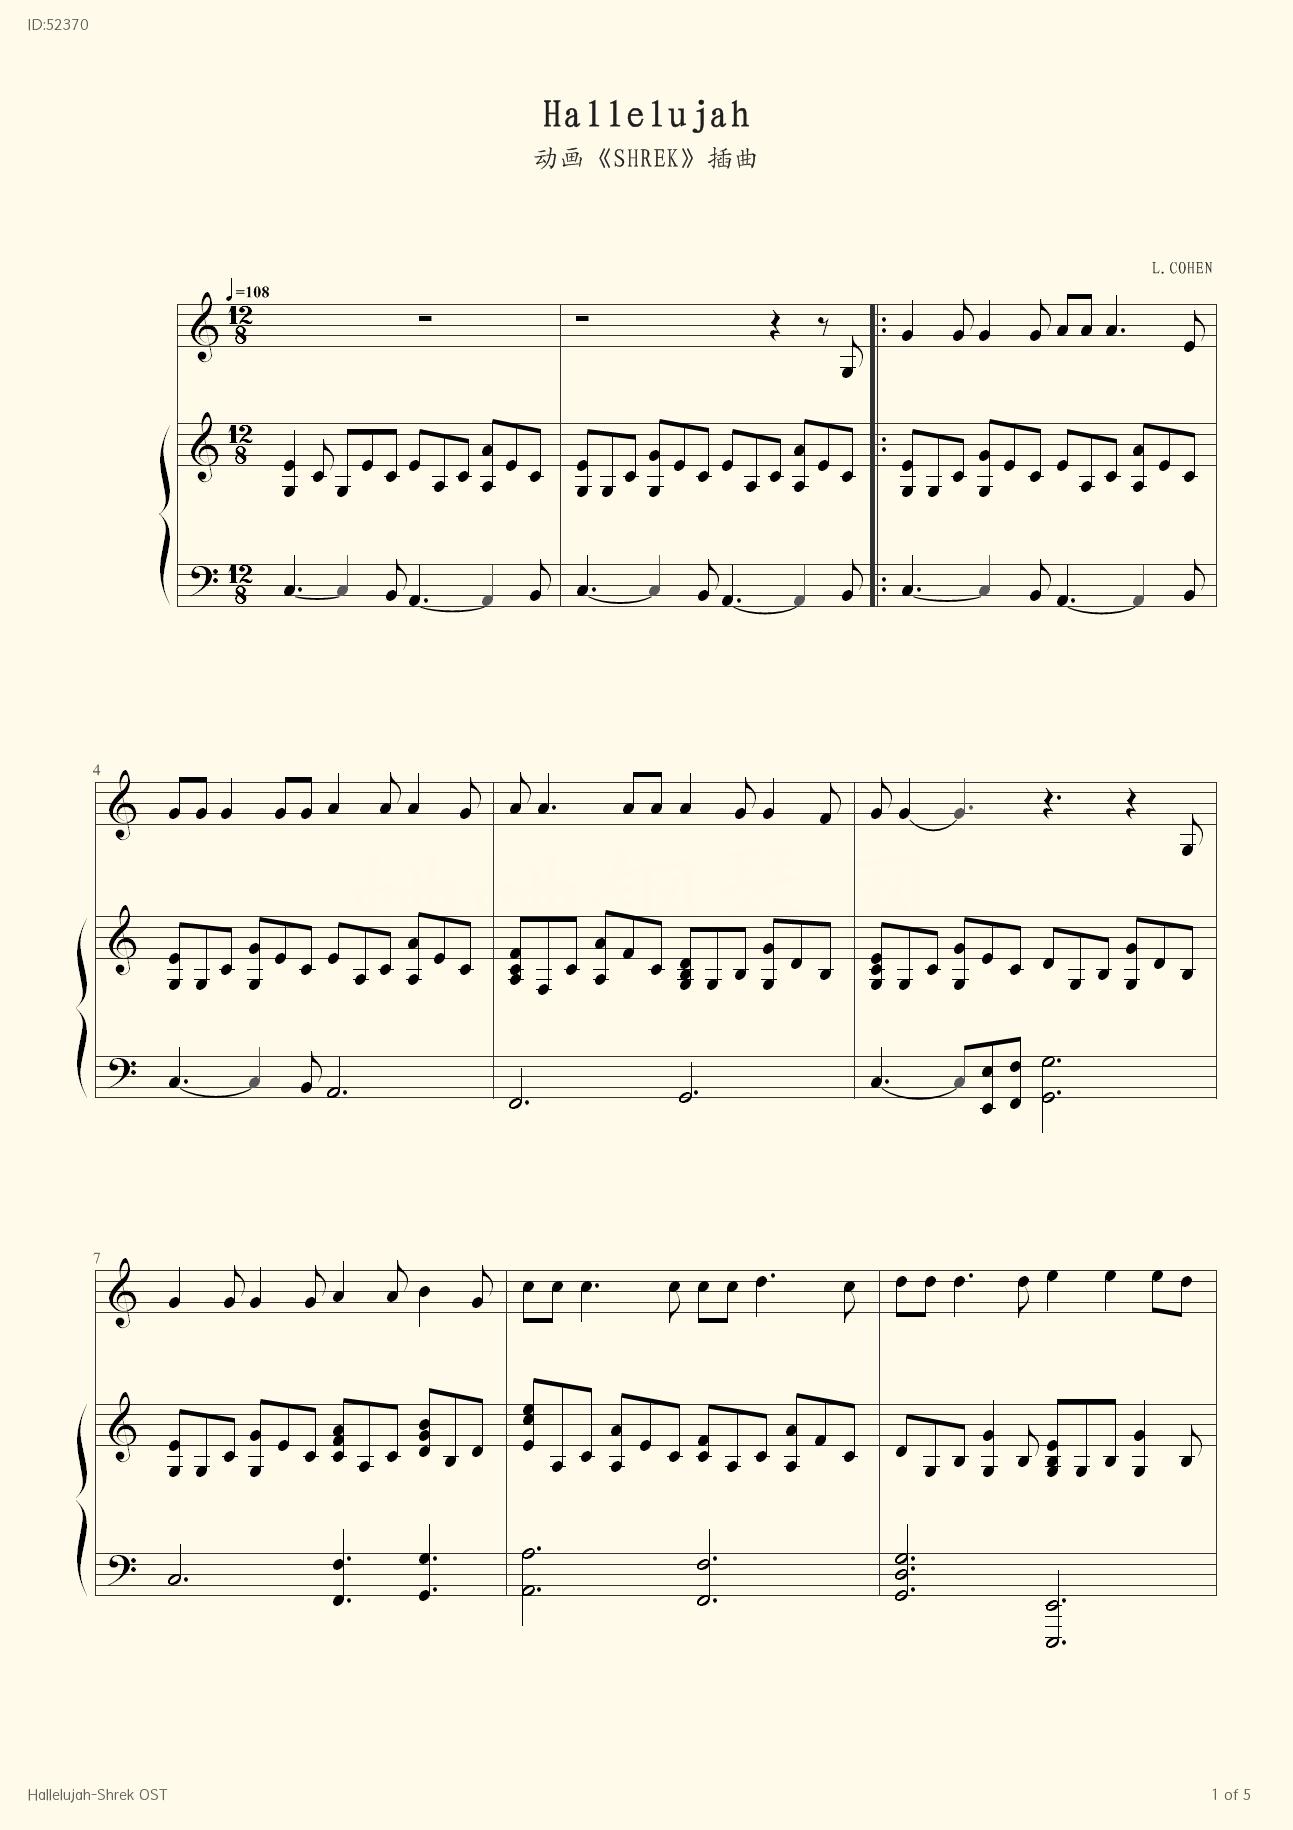 Hallelujah Shrek OST - Rufus Wainwright - first page